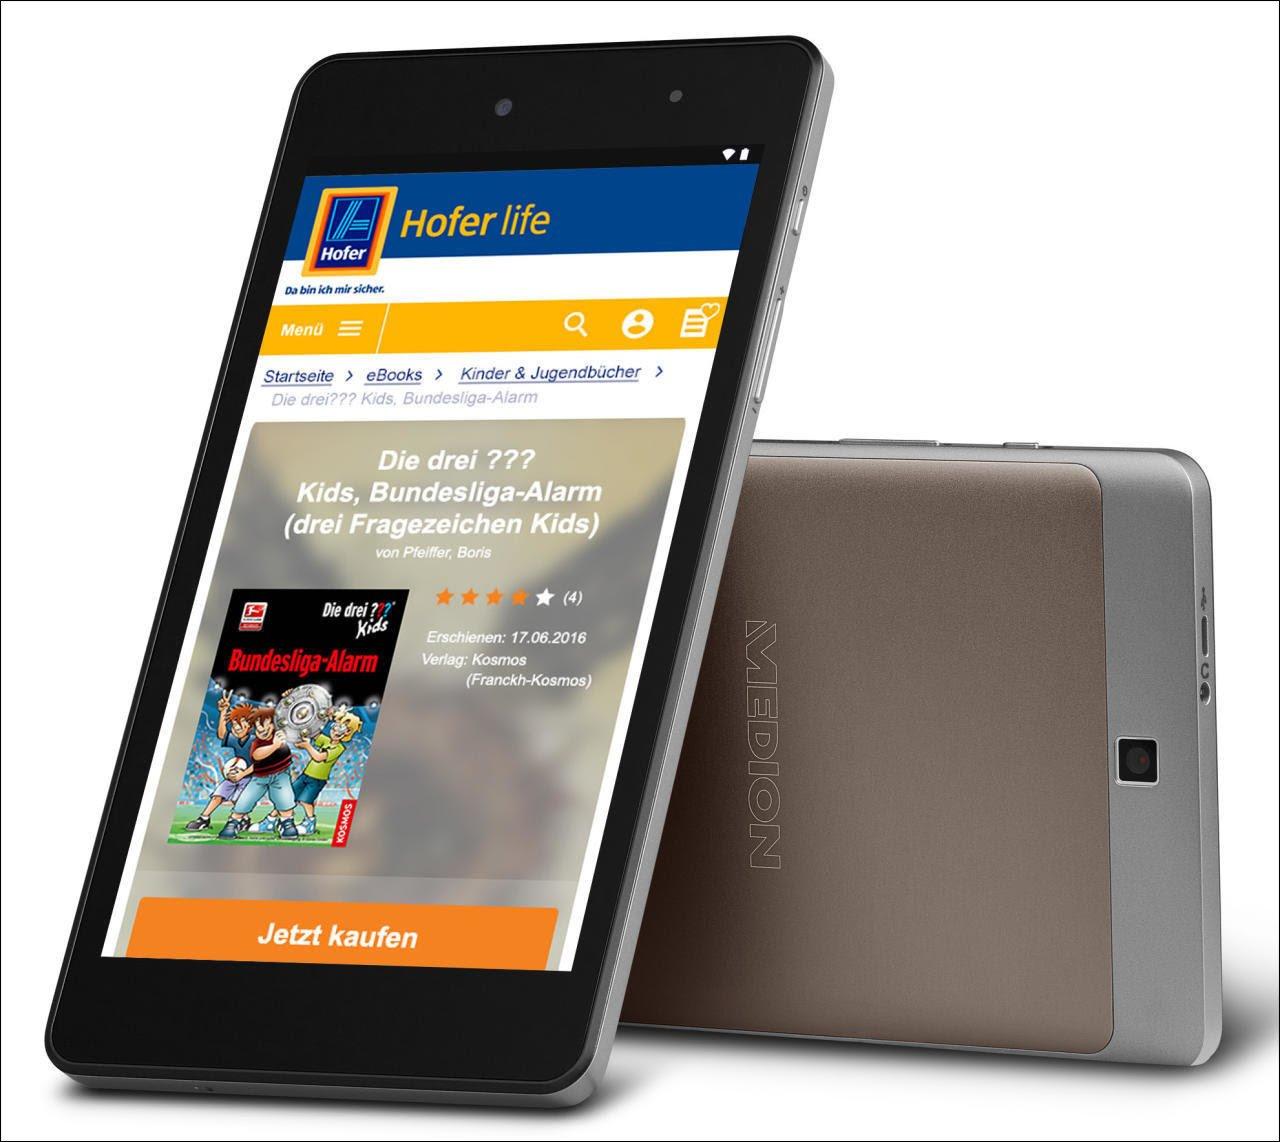 (Hofer, eventuell nur lokal) Medion E6912 eBook Reader/Tablet um 19,99€ statt 99,99€